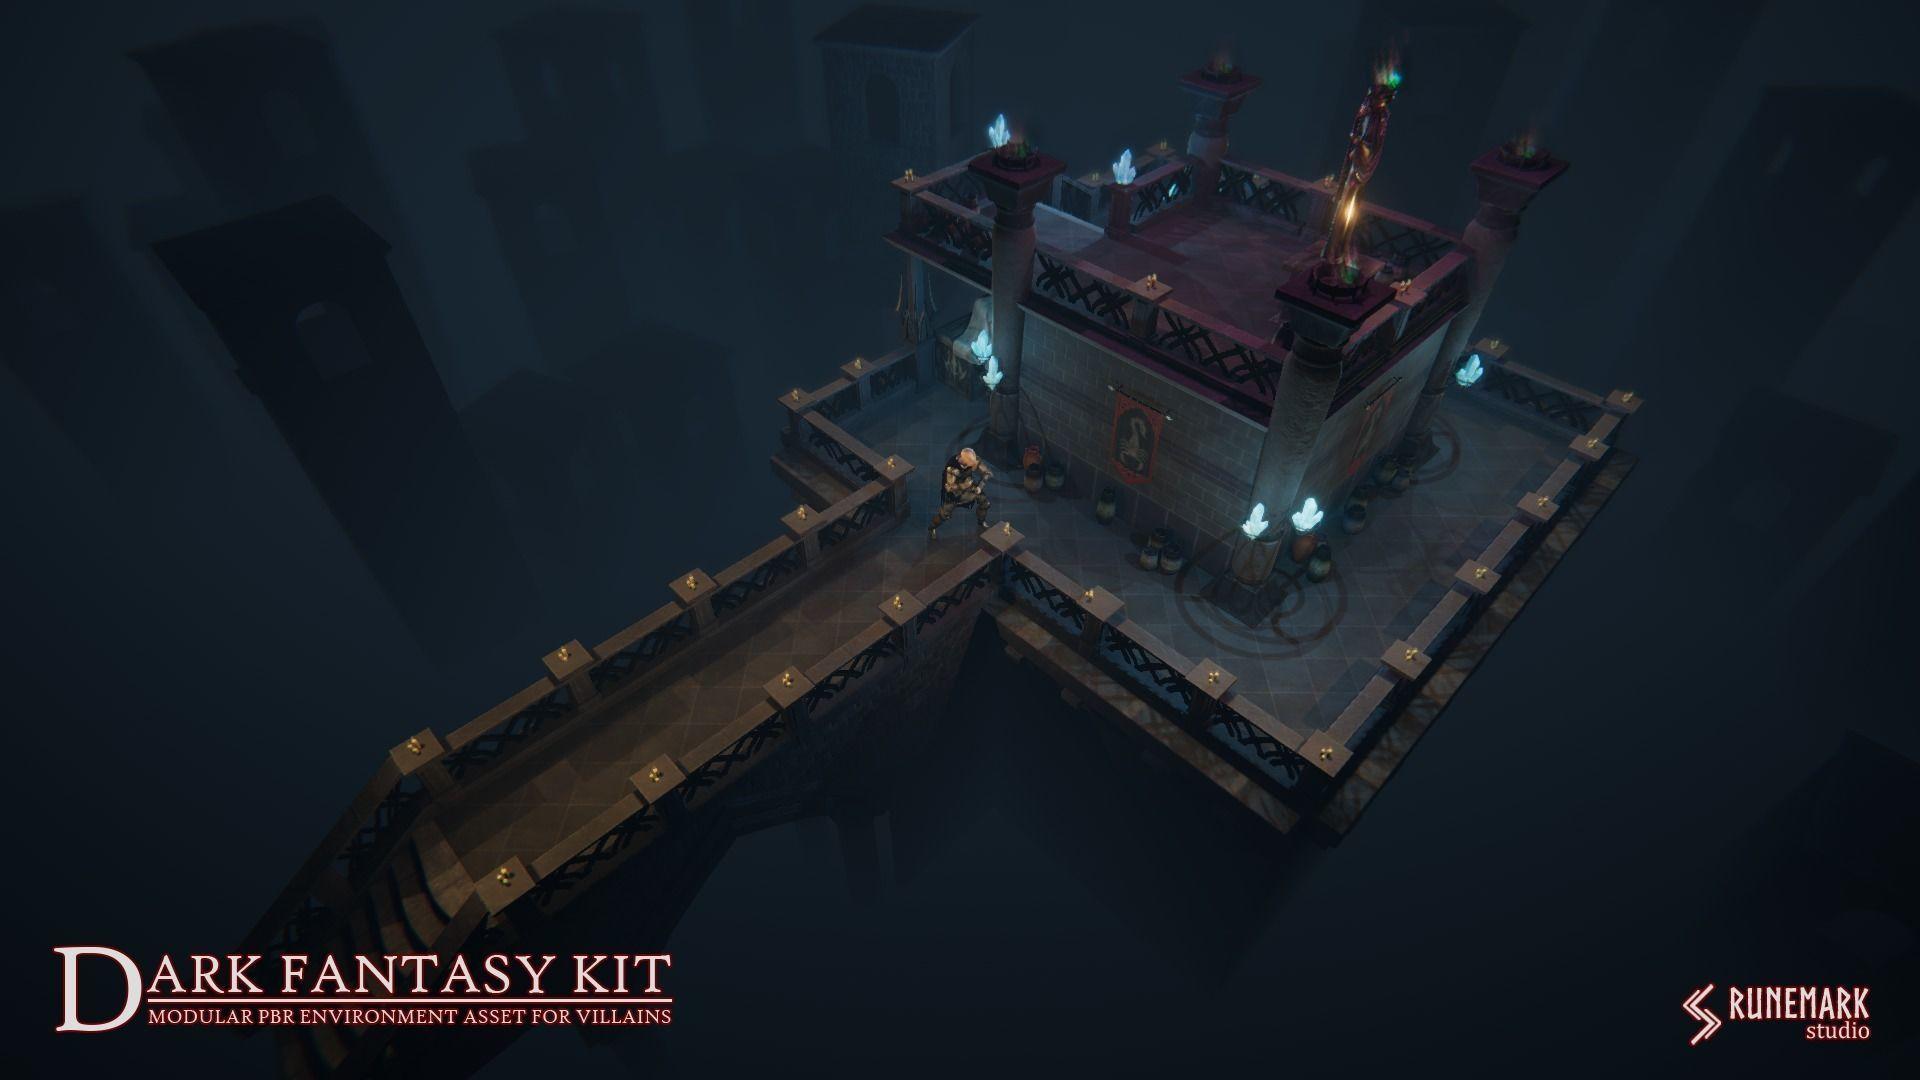 Dark Fantasy Kit